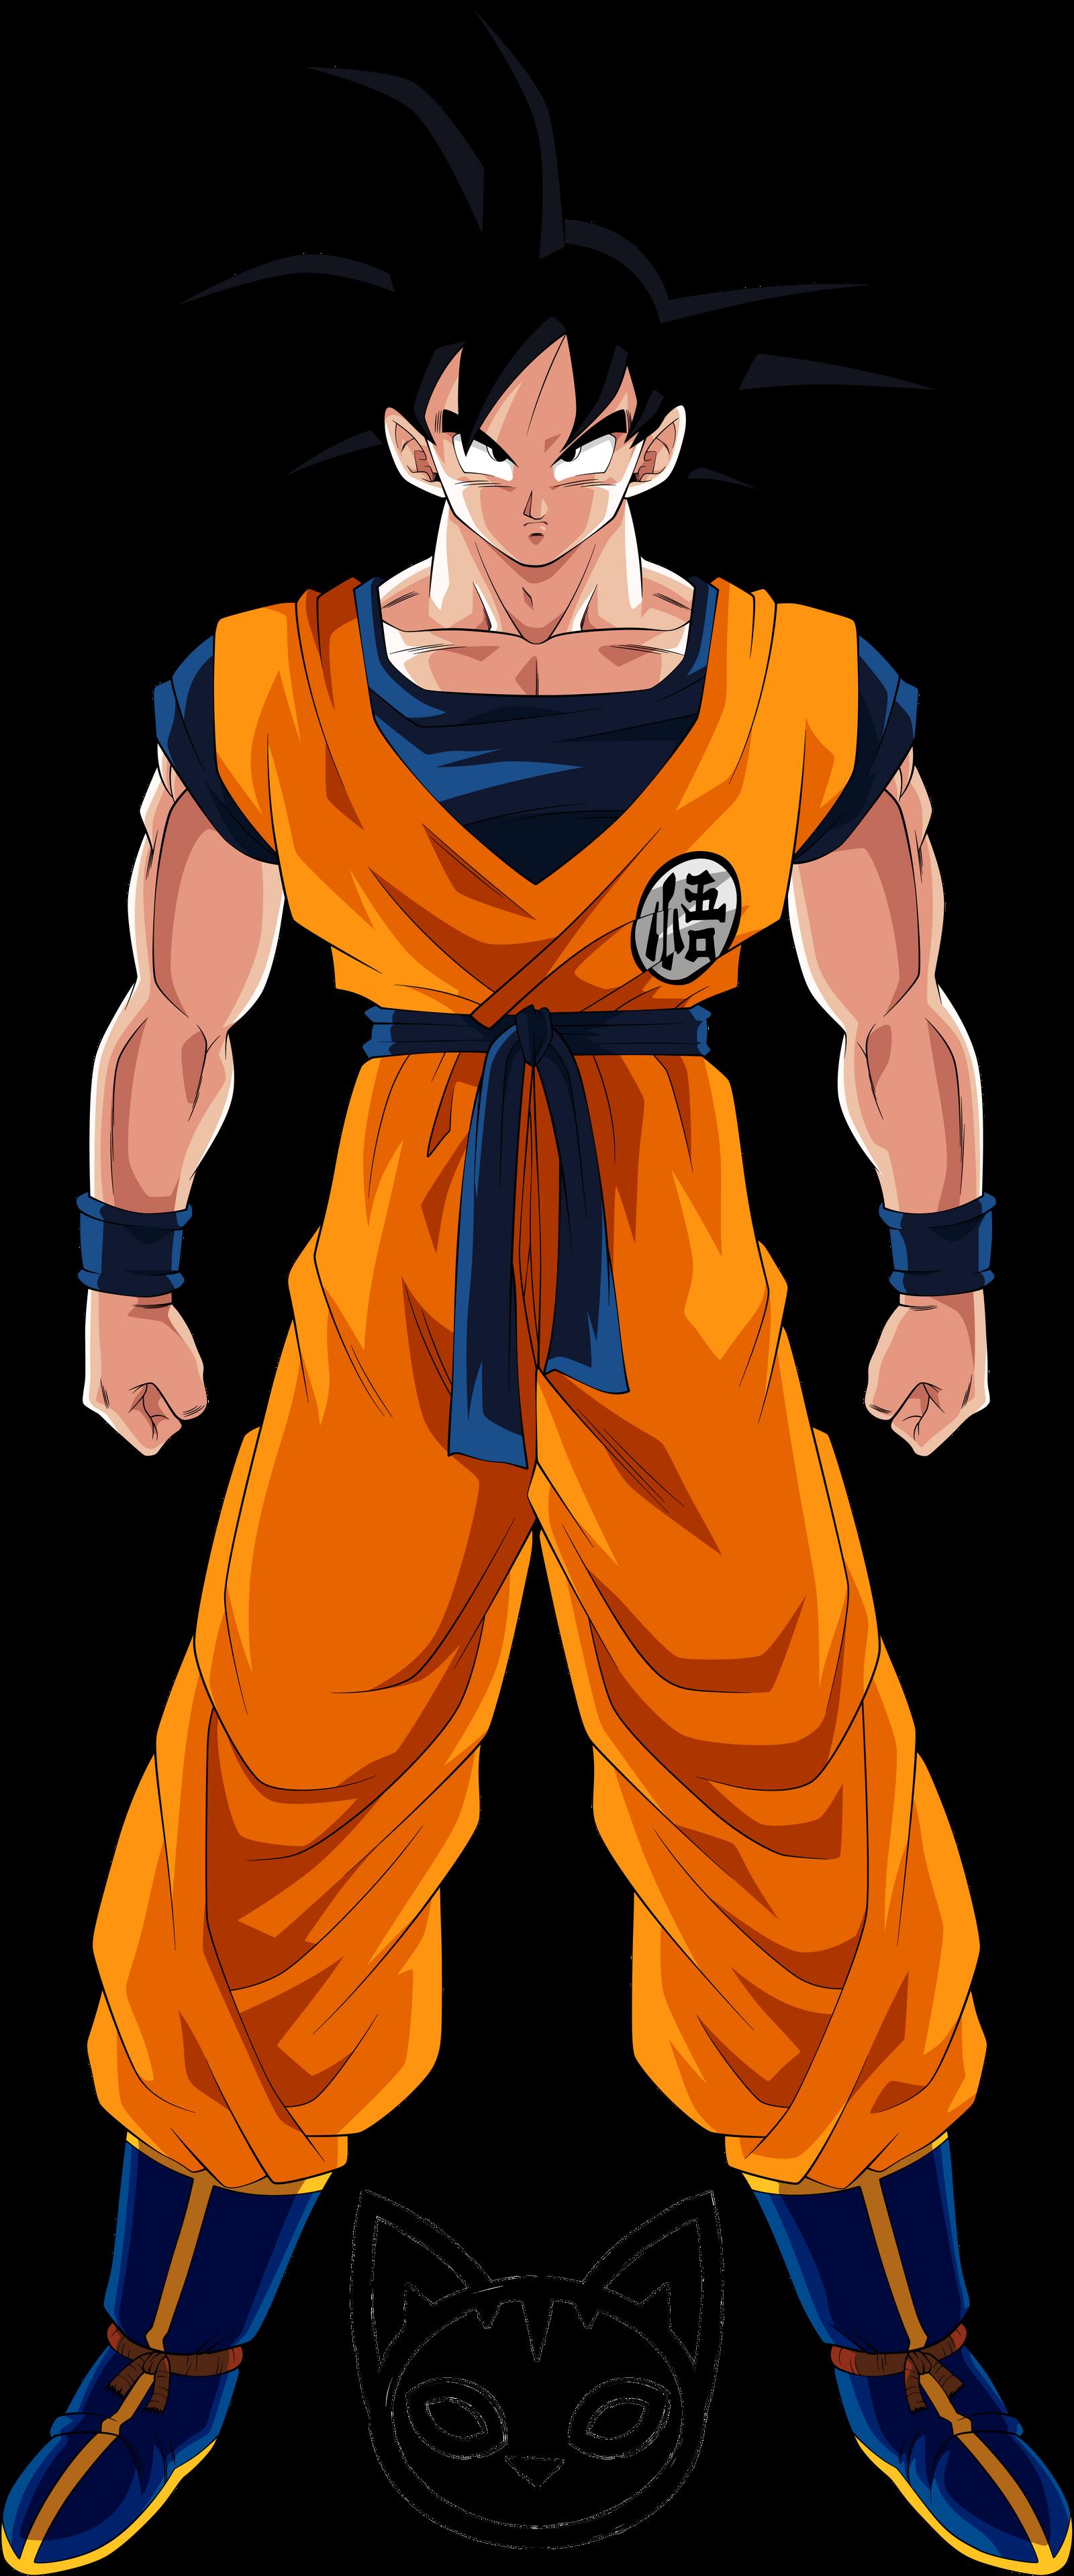 Goku By Thetabbyneko On Deviantart Dragon Ball Super Goku Dragon Ball Image Dragon Ball Goku